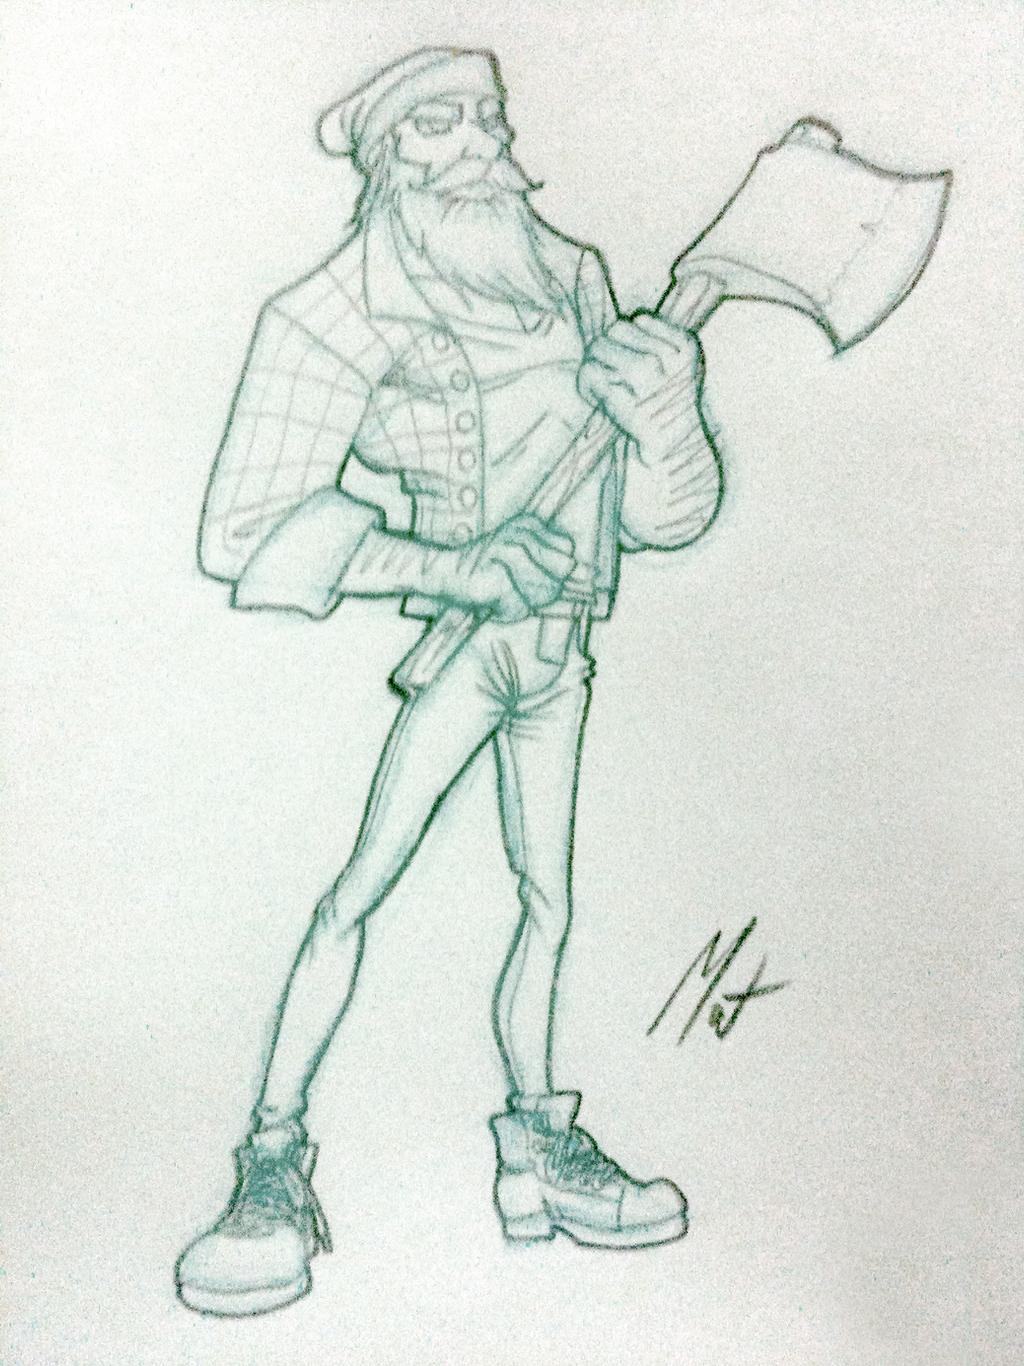 Woodsman - First Sketch by SaTTaR